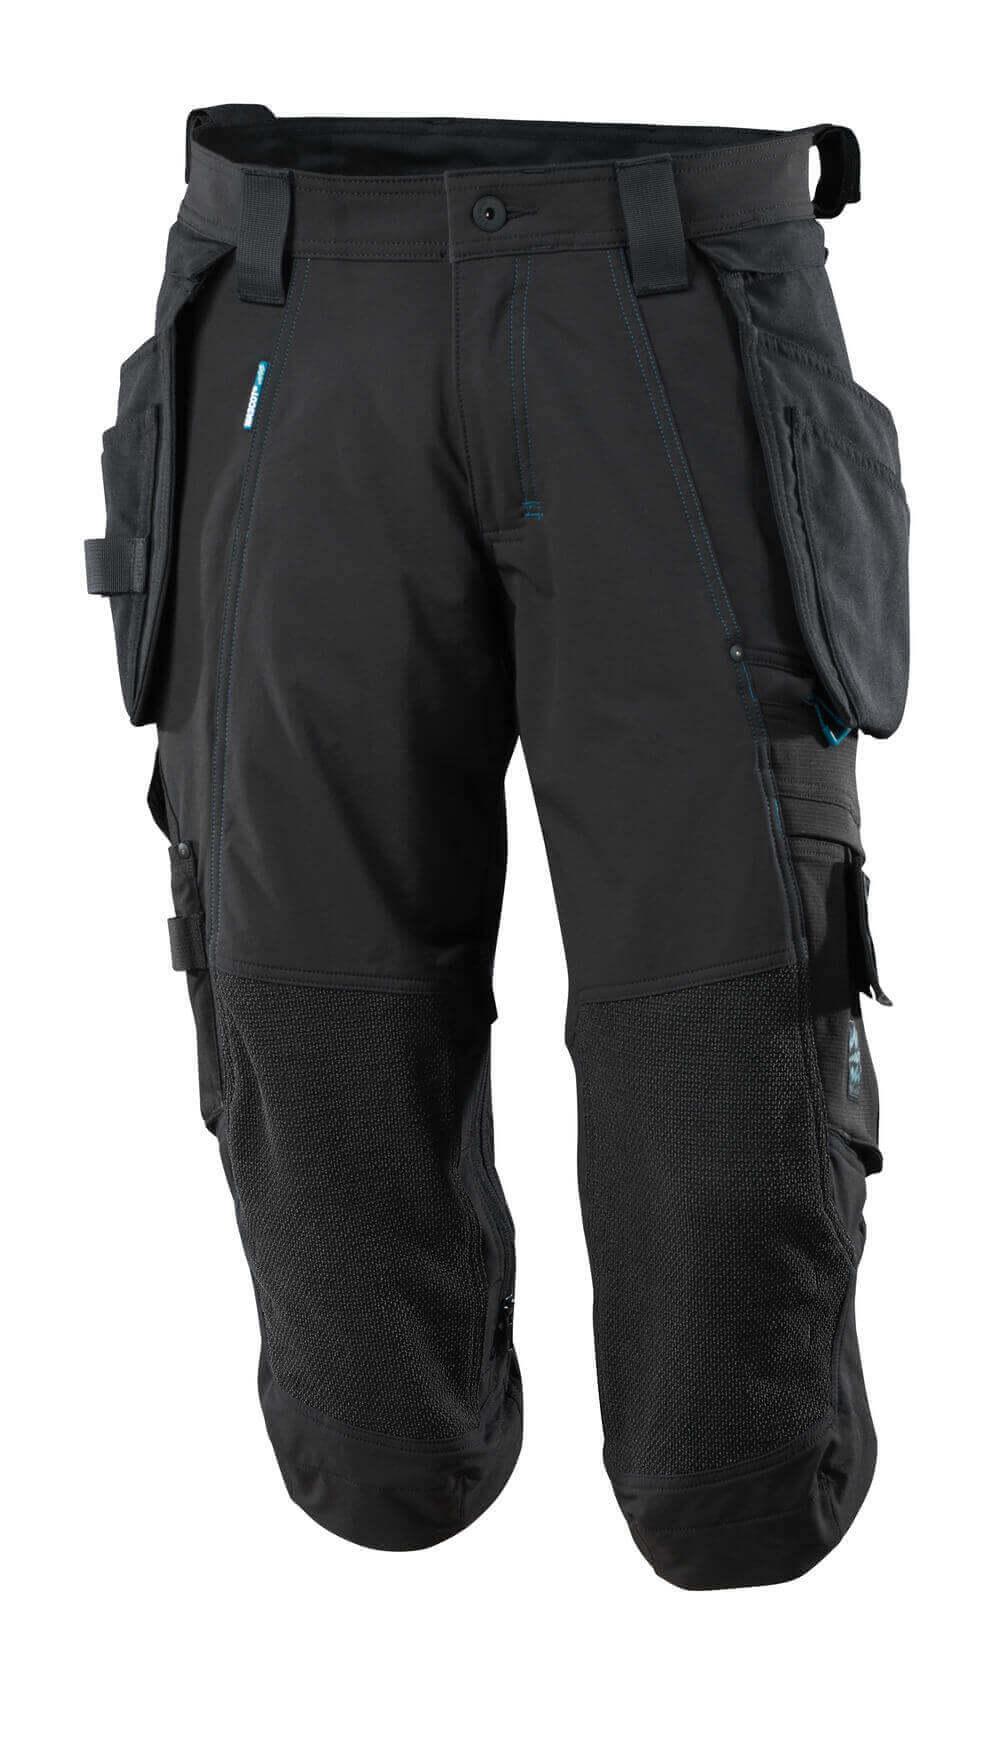 ¾ Length Trousers, holster pockets, str.